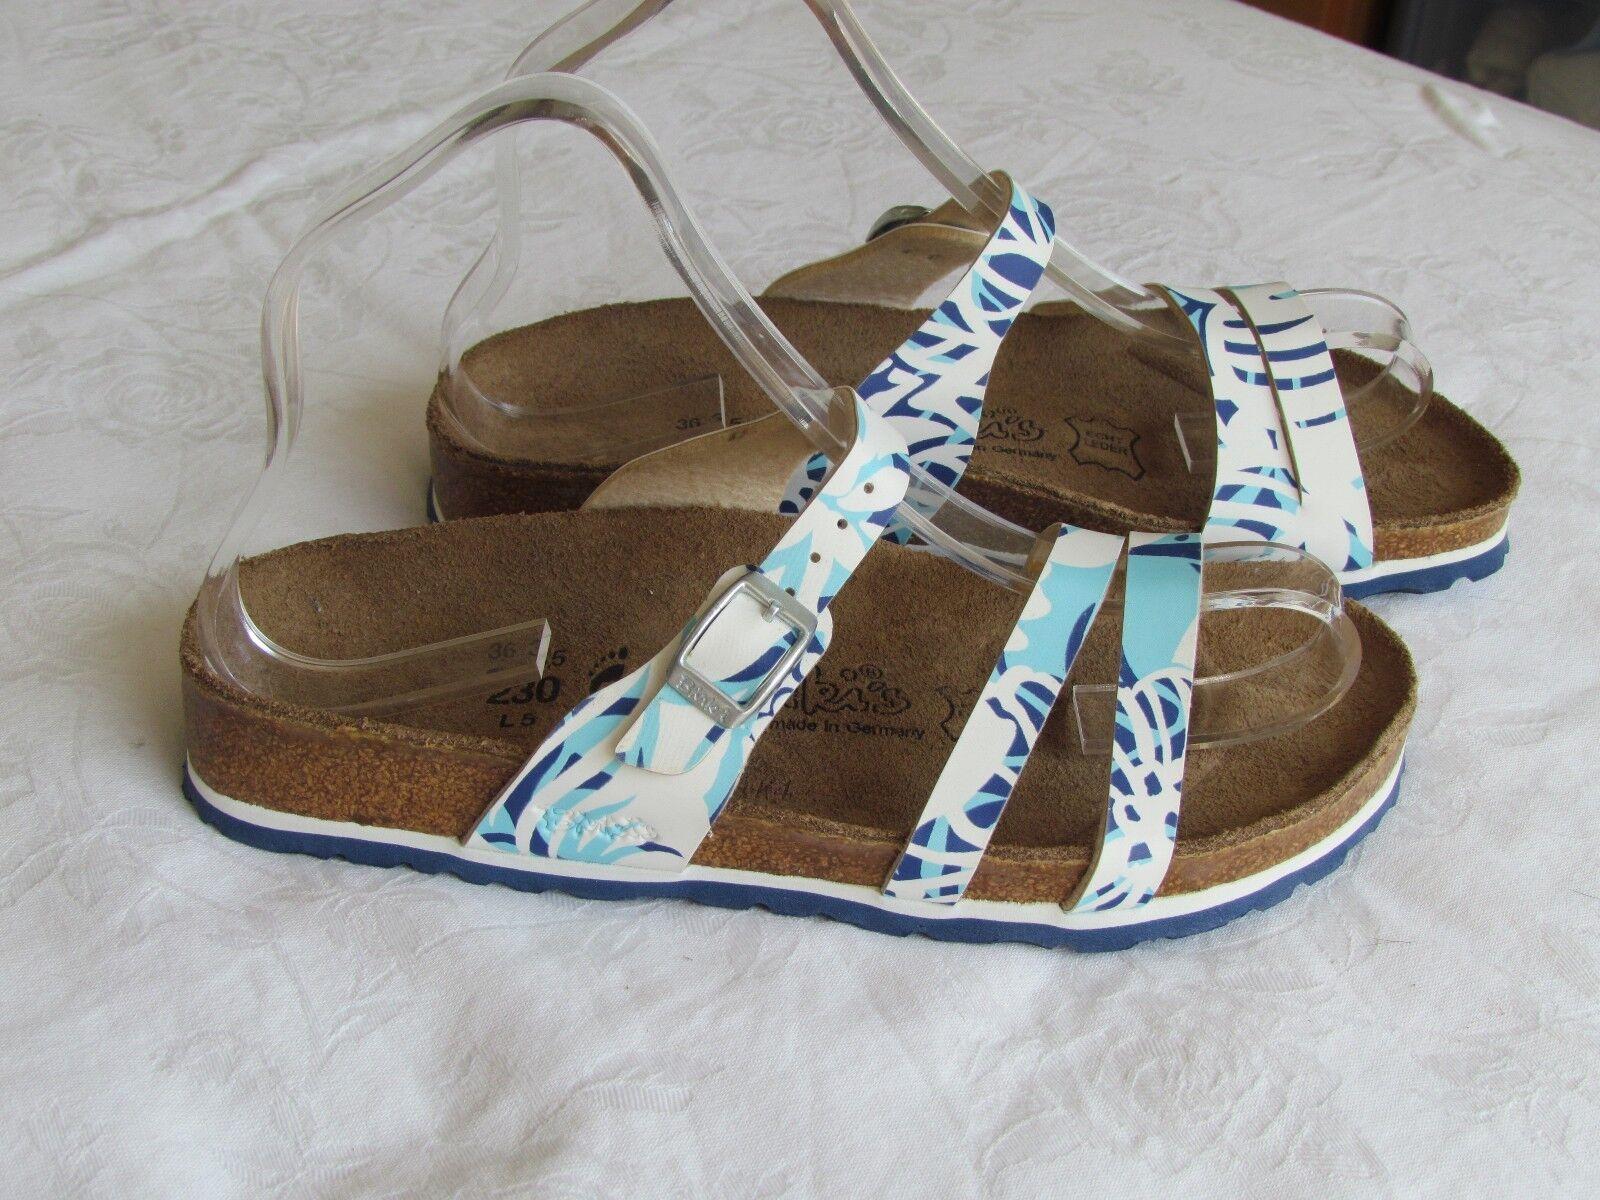 Último gran descuento NEW Birkis By Birkenstock Ladies White & Navy Blue Mules Sandals Size 3.5 EU 36